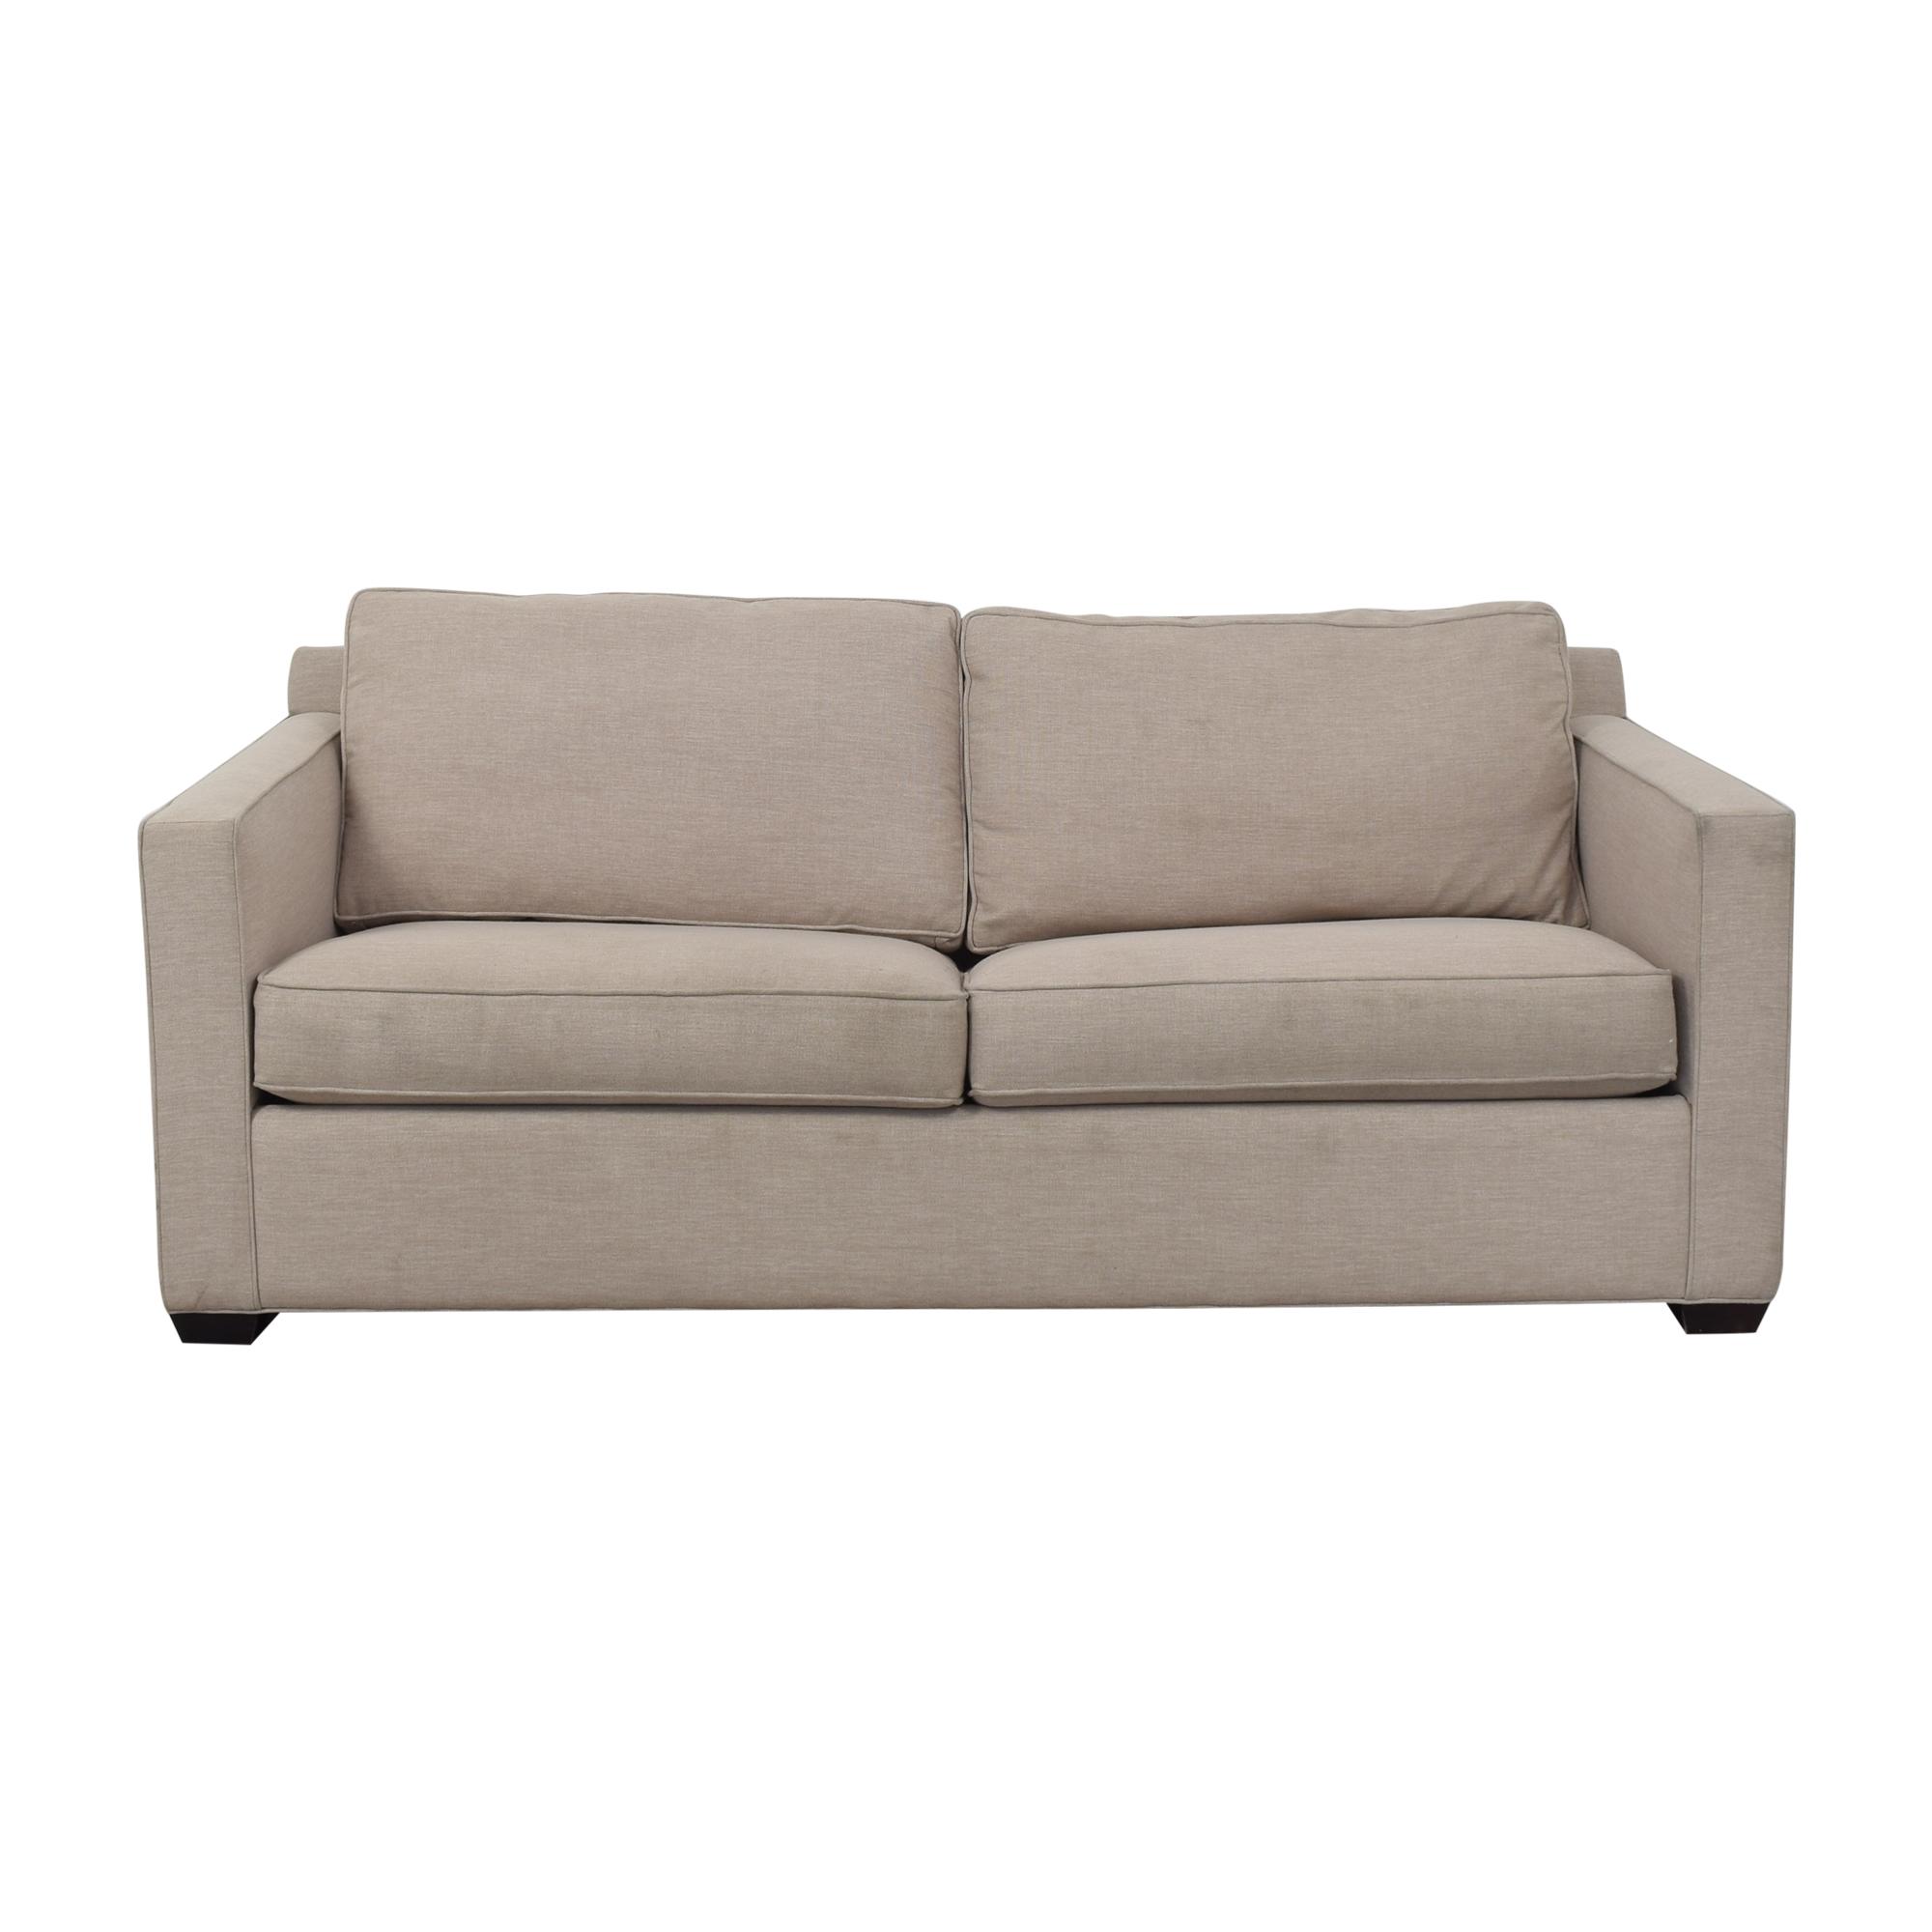 Crate & Barrel Crate & Barrel Two Cushion Sleeper Sofa